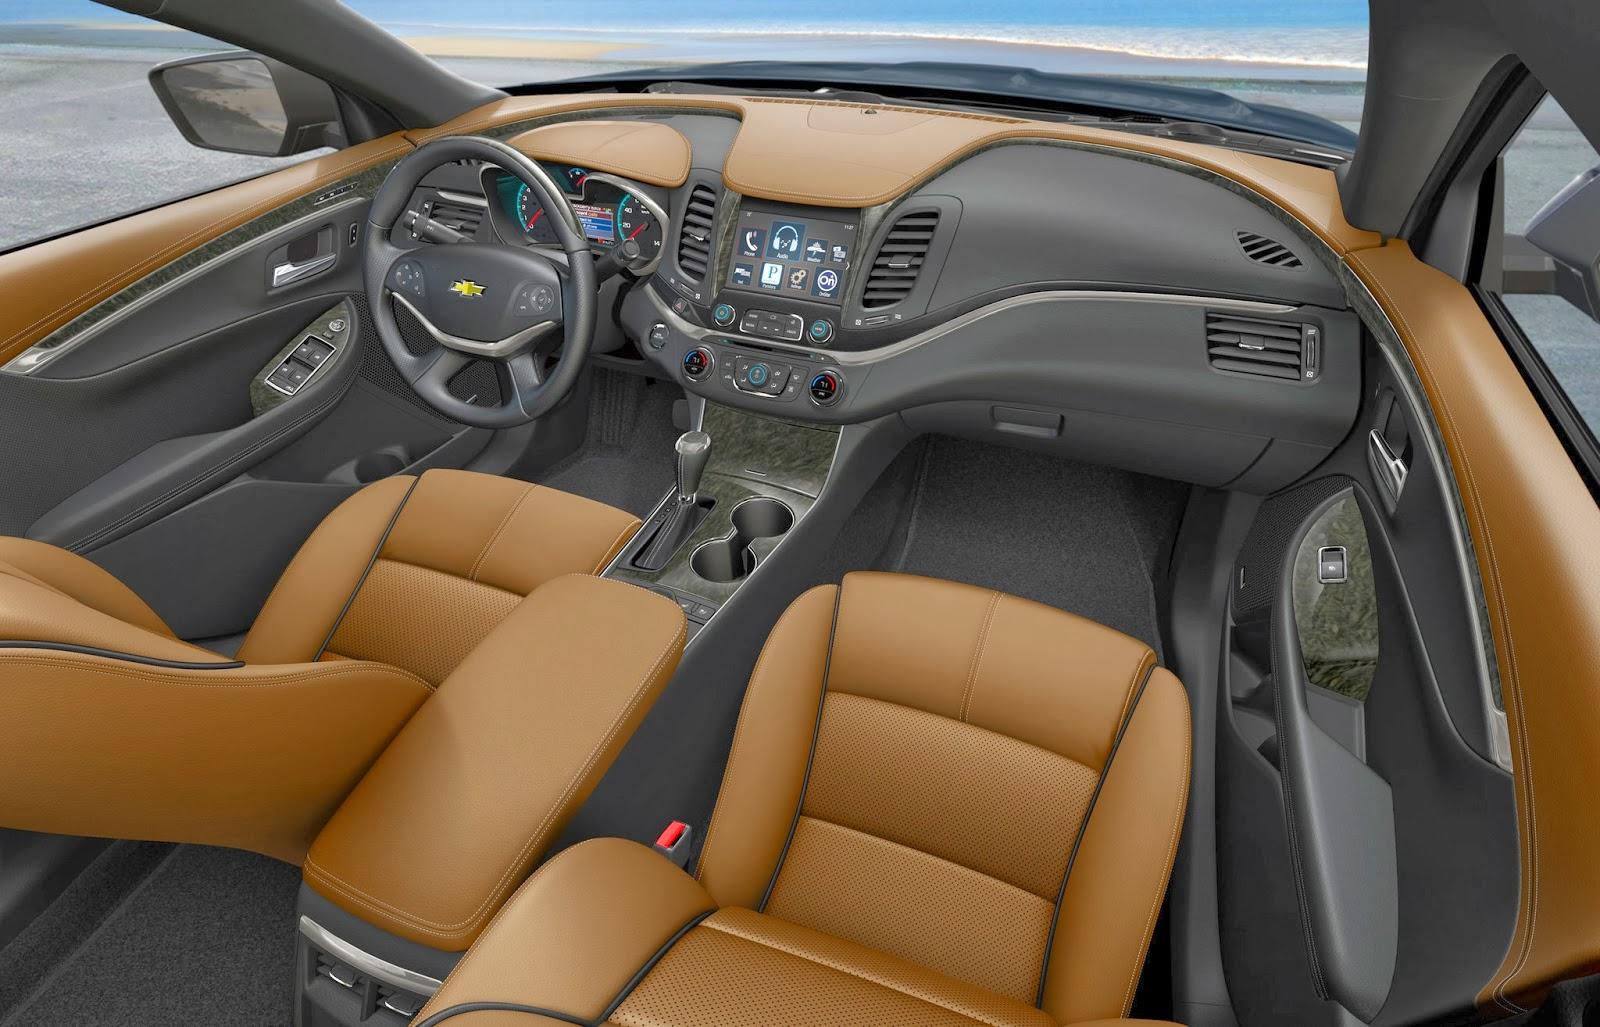 2015 chevy 6 2 engine autos post. Black Bedroom Furniture Sets. Home Design Ideas